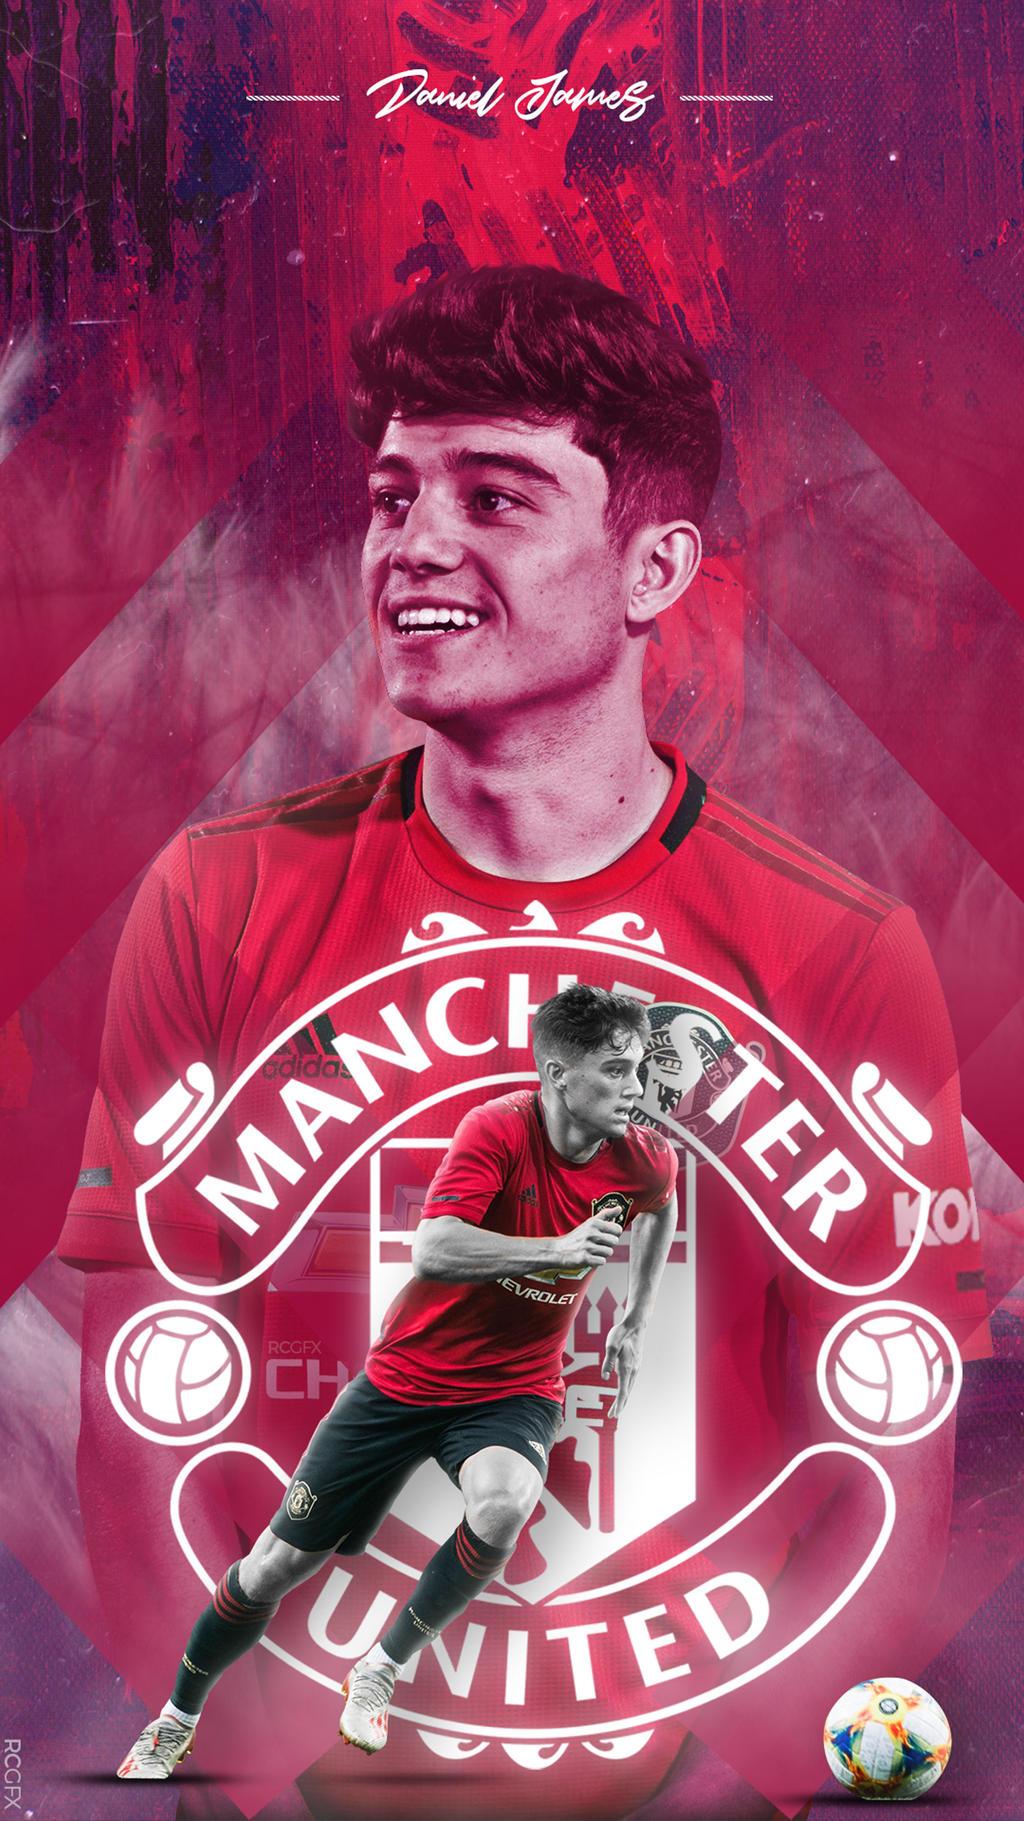 Daniel James Manchester United Wallpaper Hd